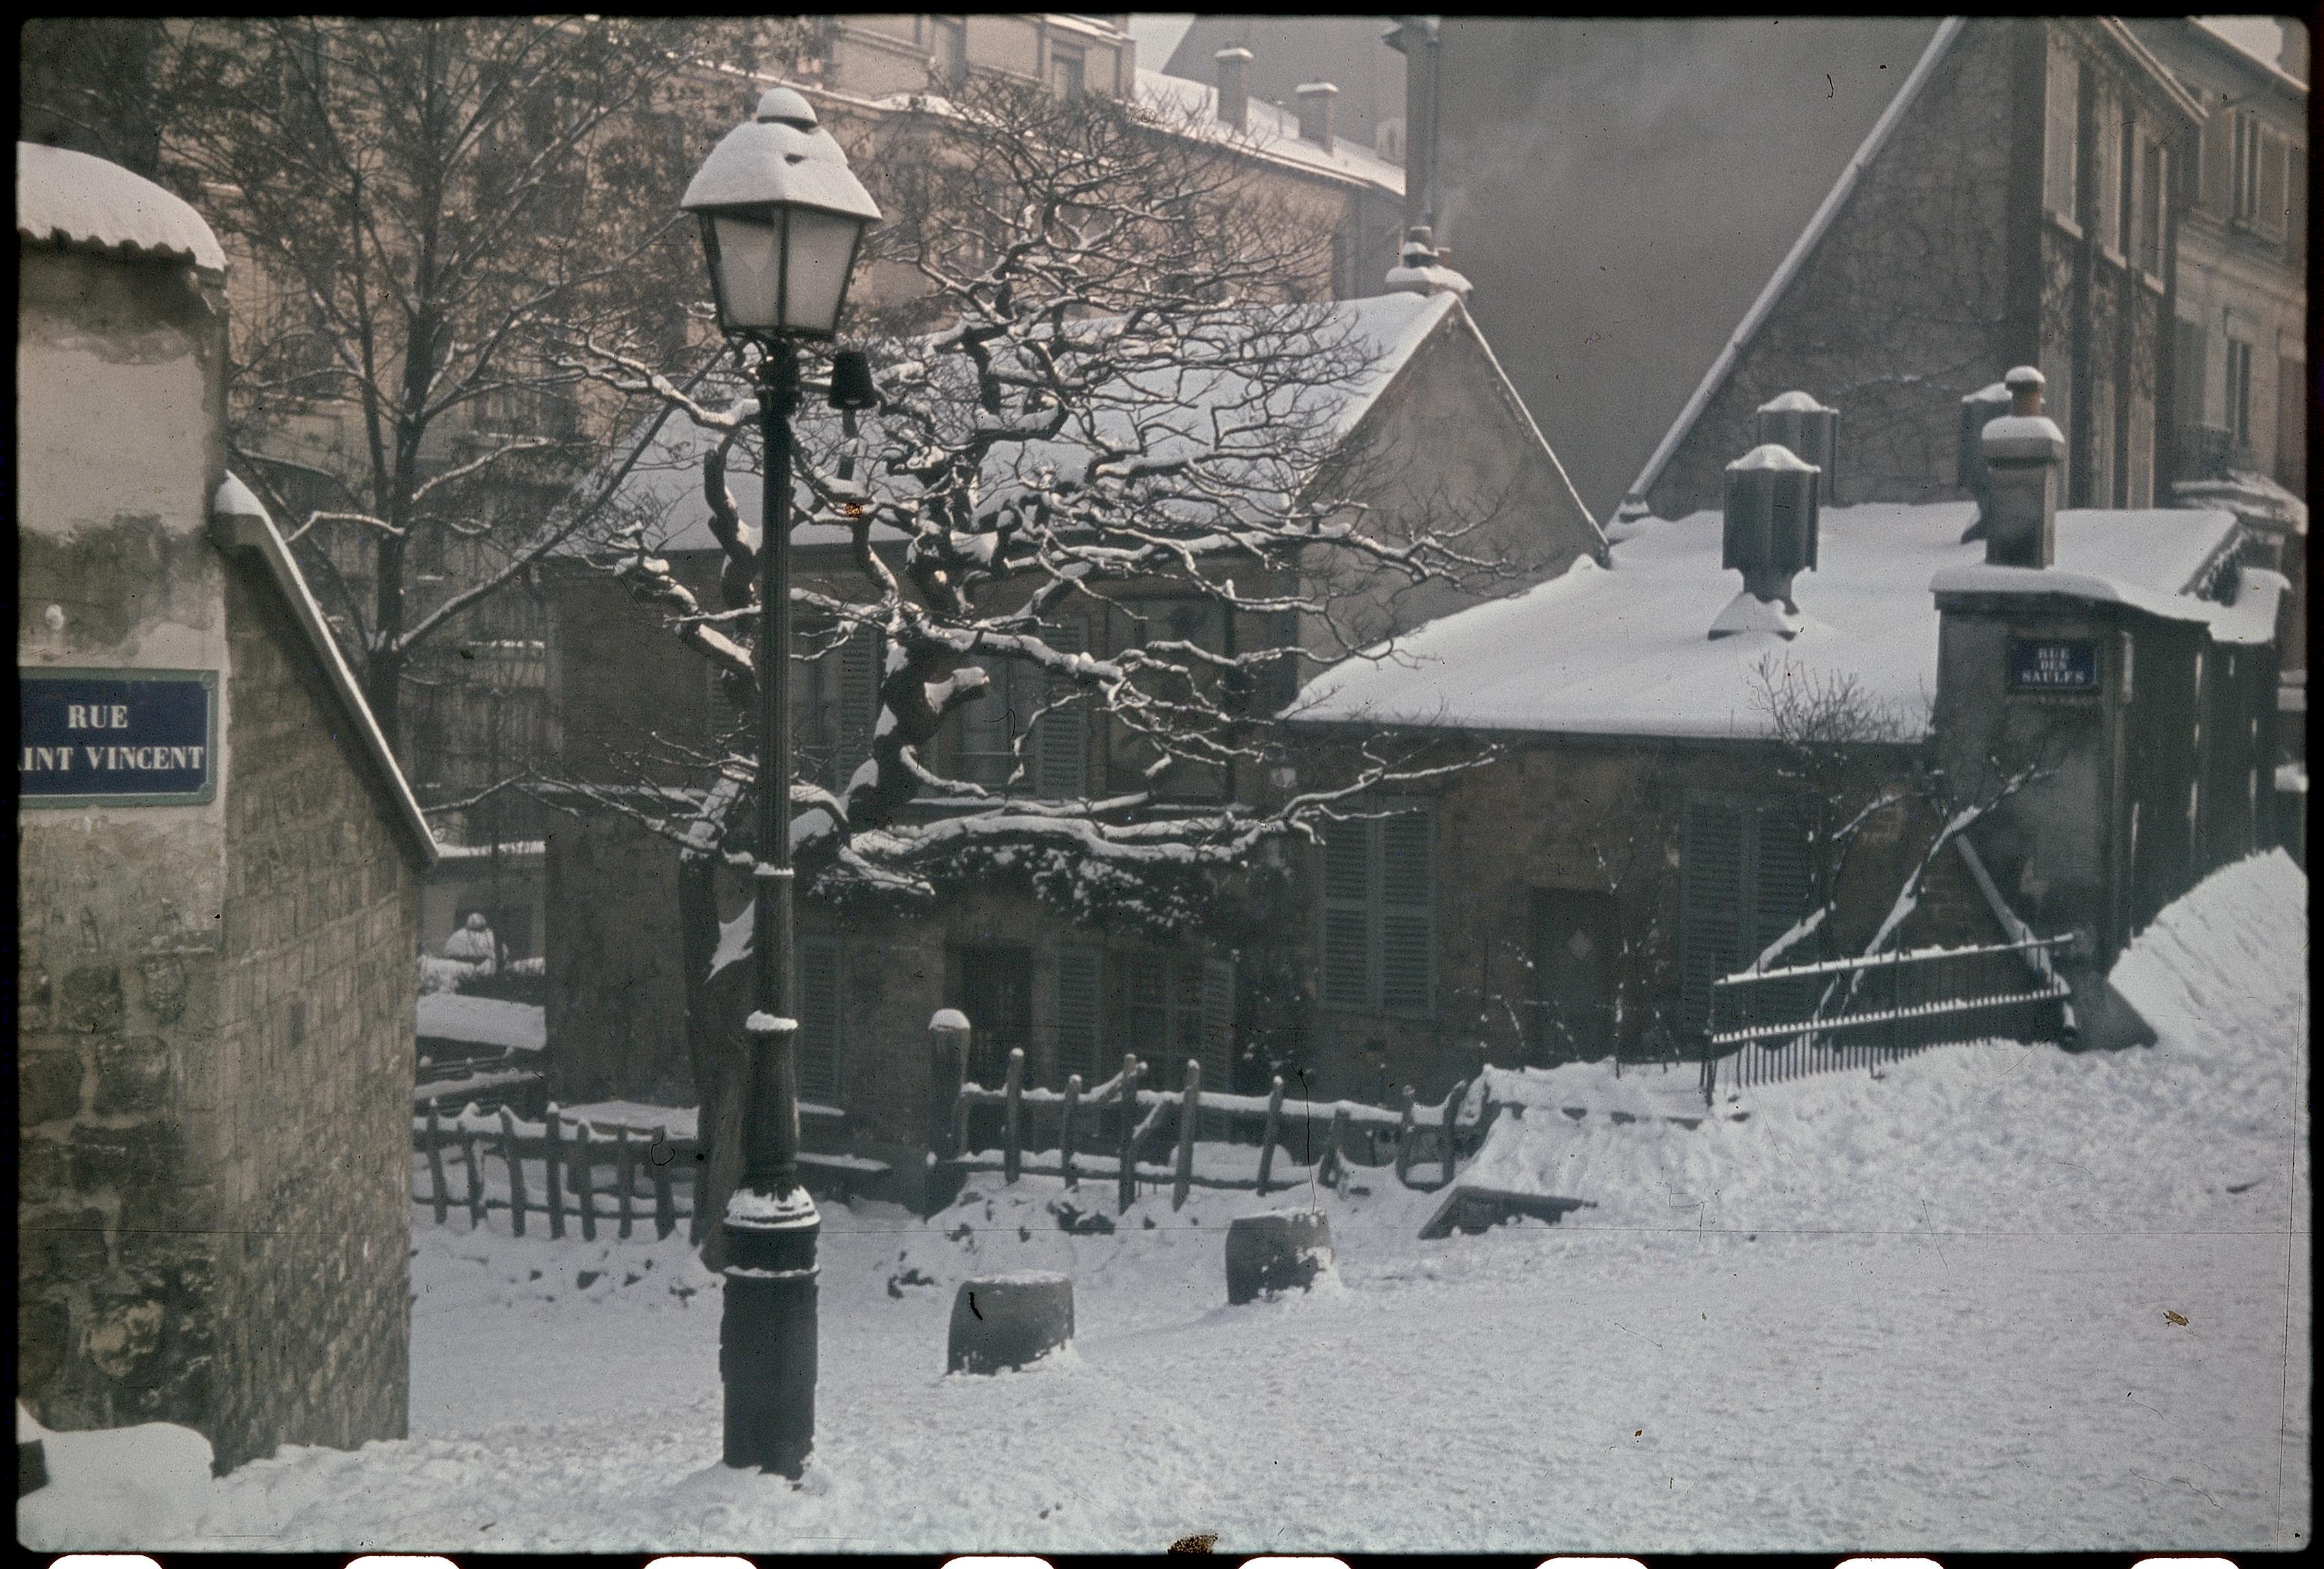 Монмартр. Улица Сен-Венсан